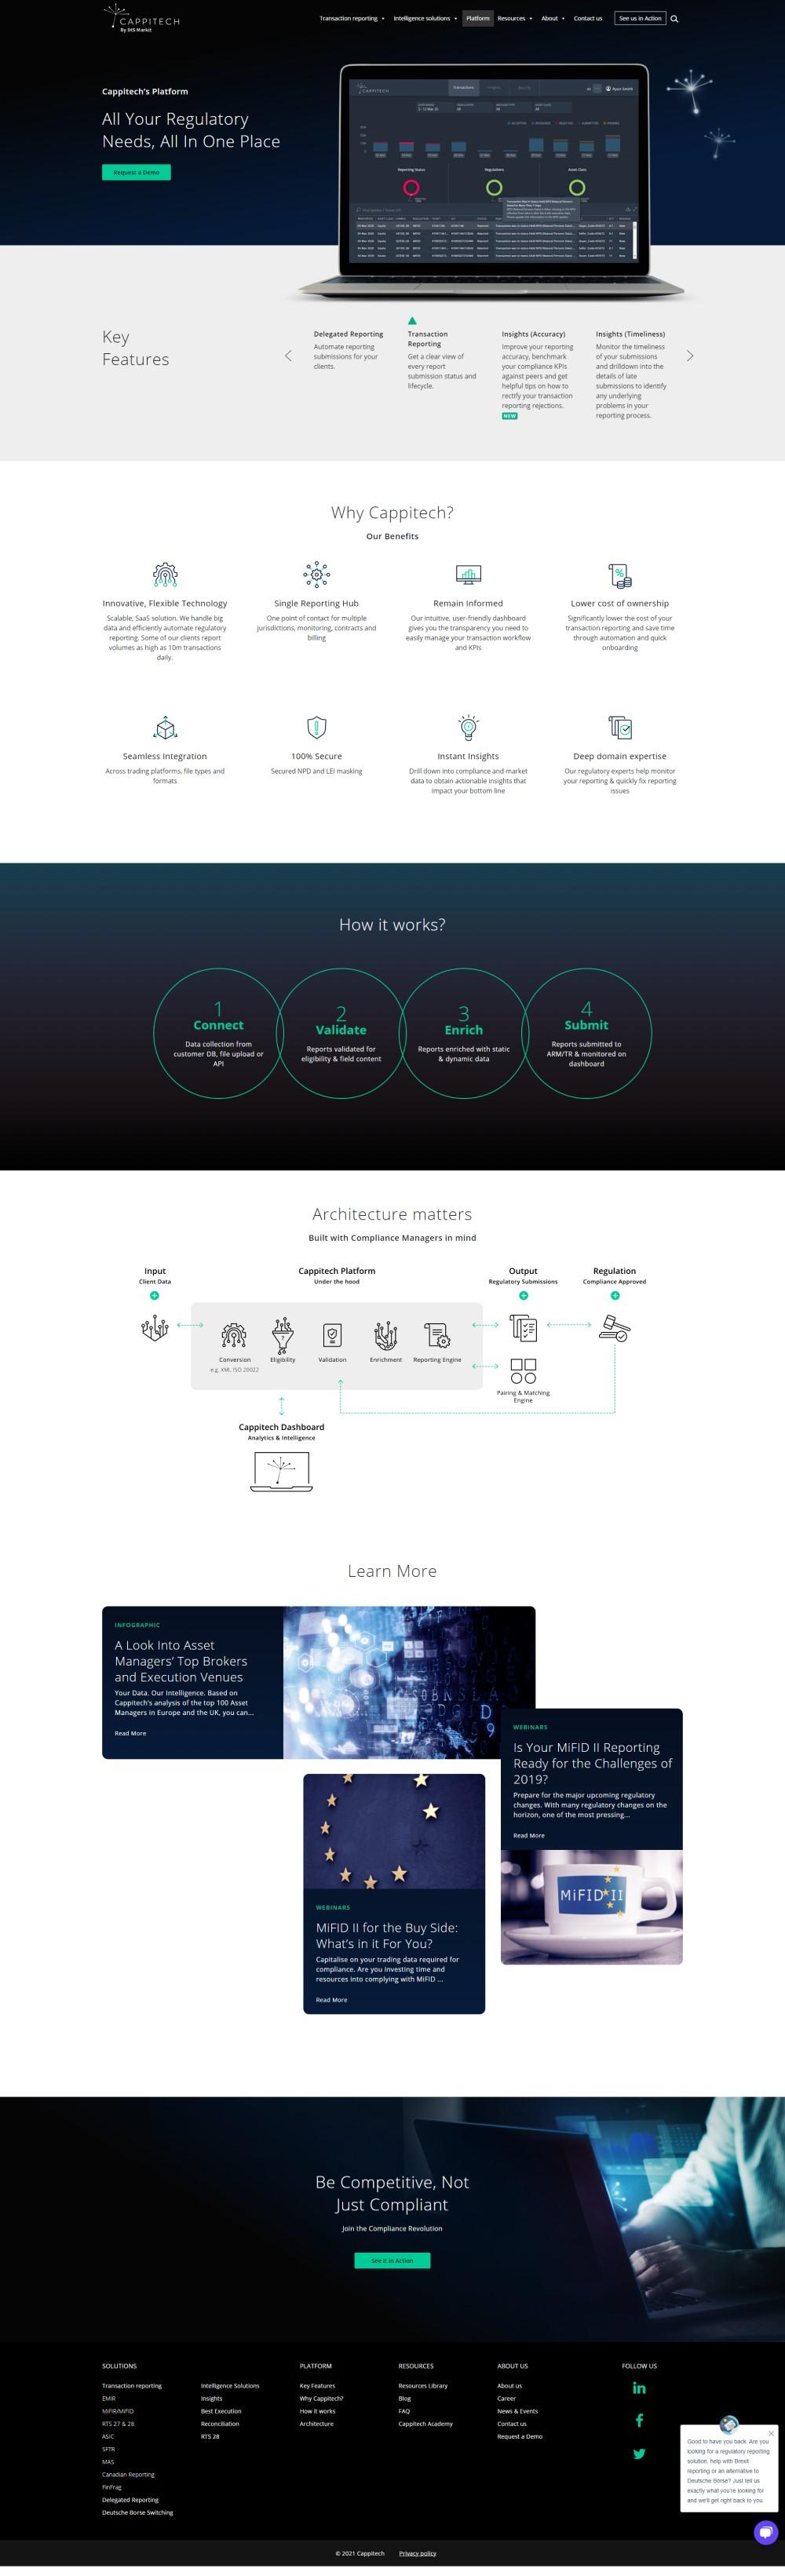 platform full page